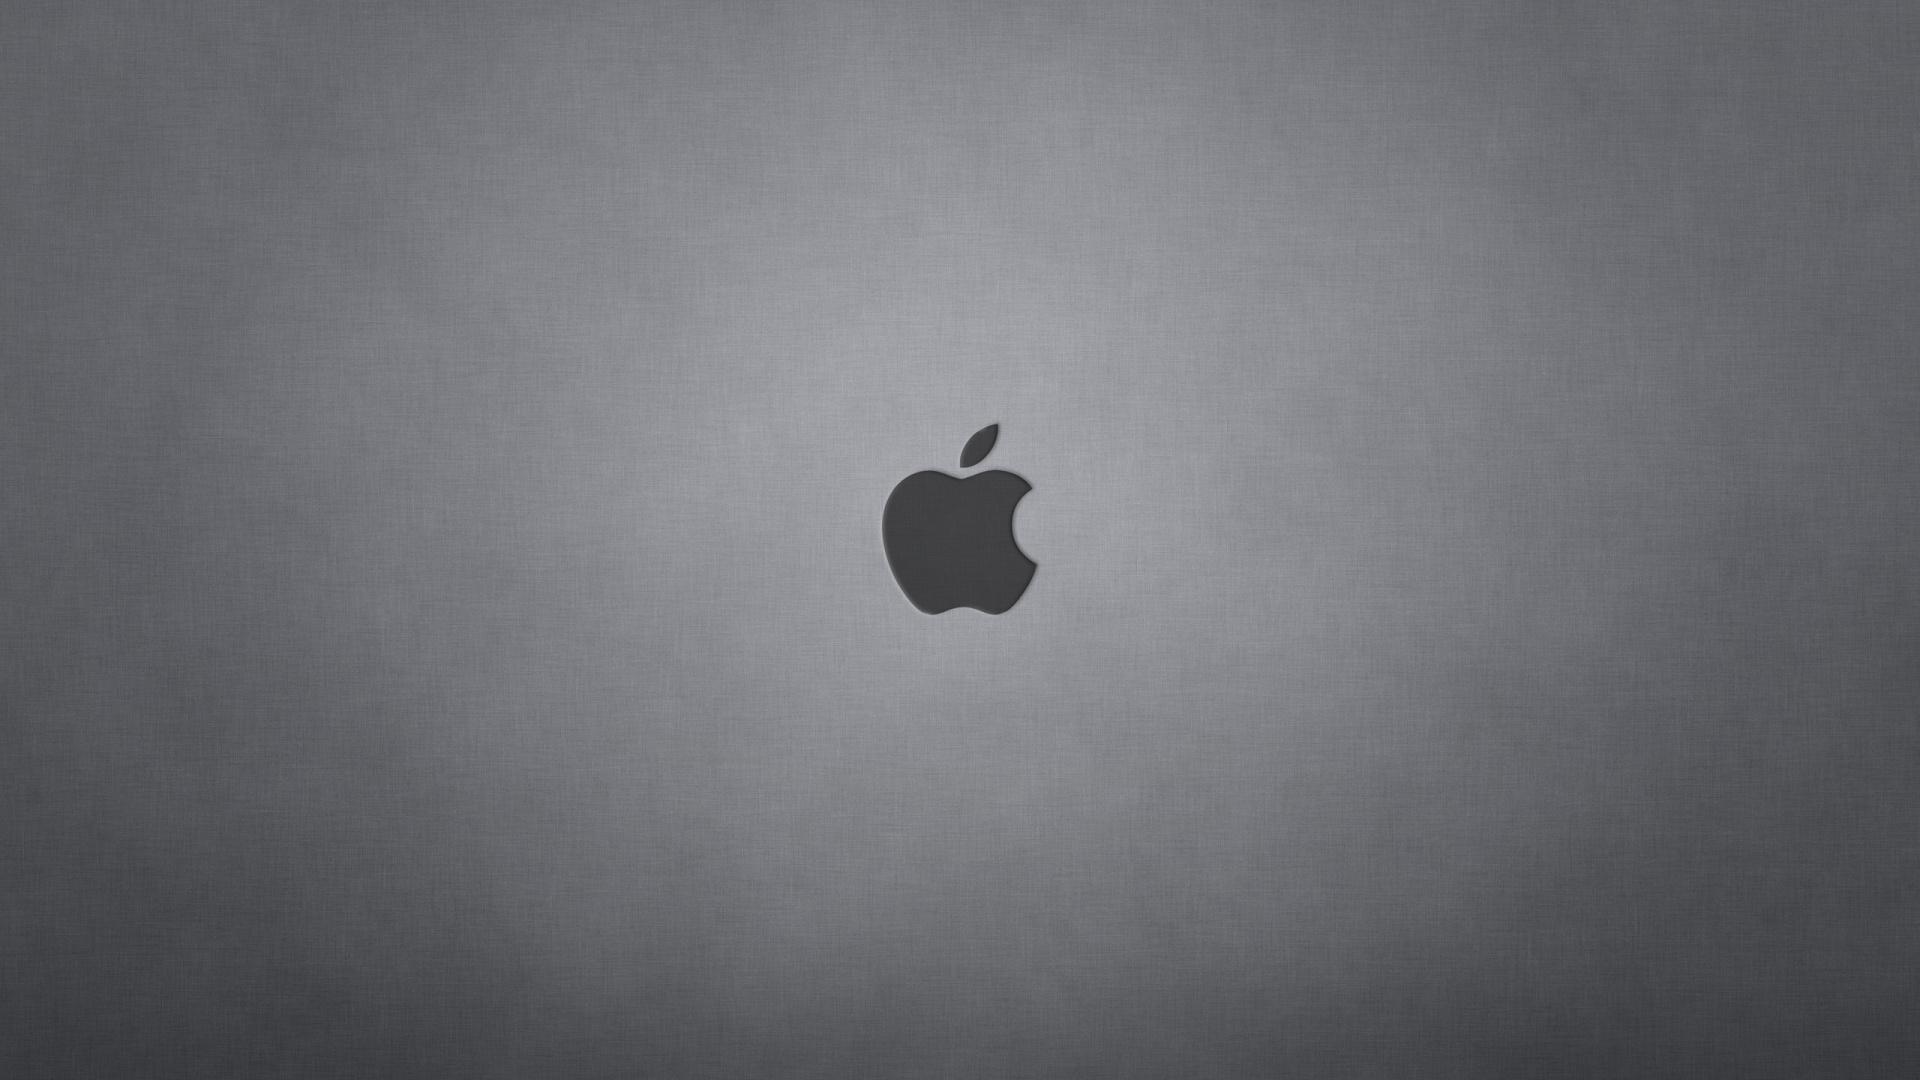 HD s for Mac wallpaper | 1920x1080 | #43795